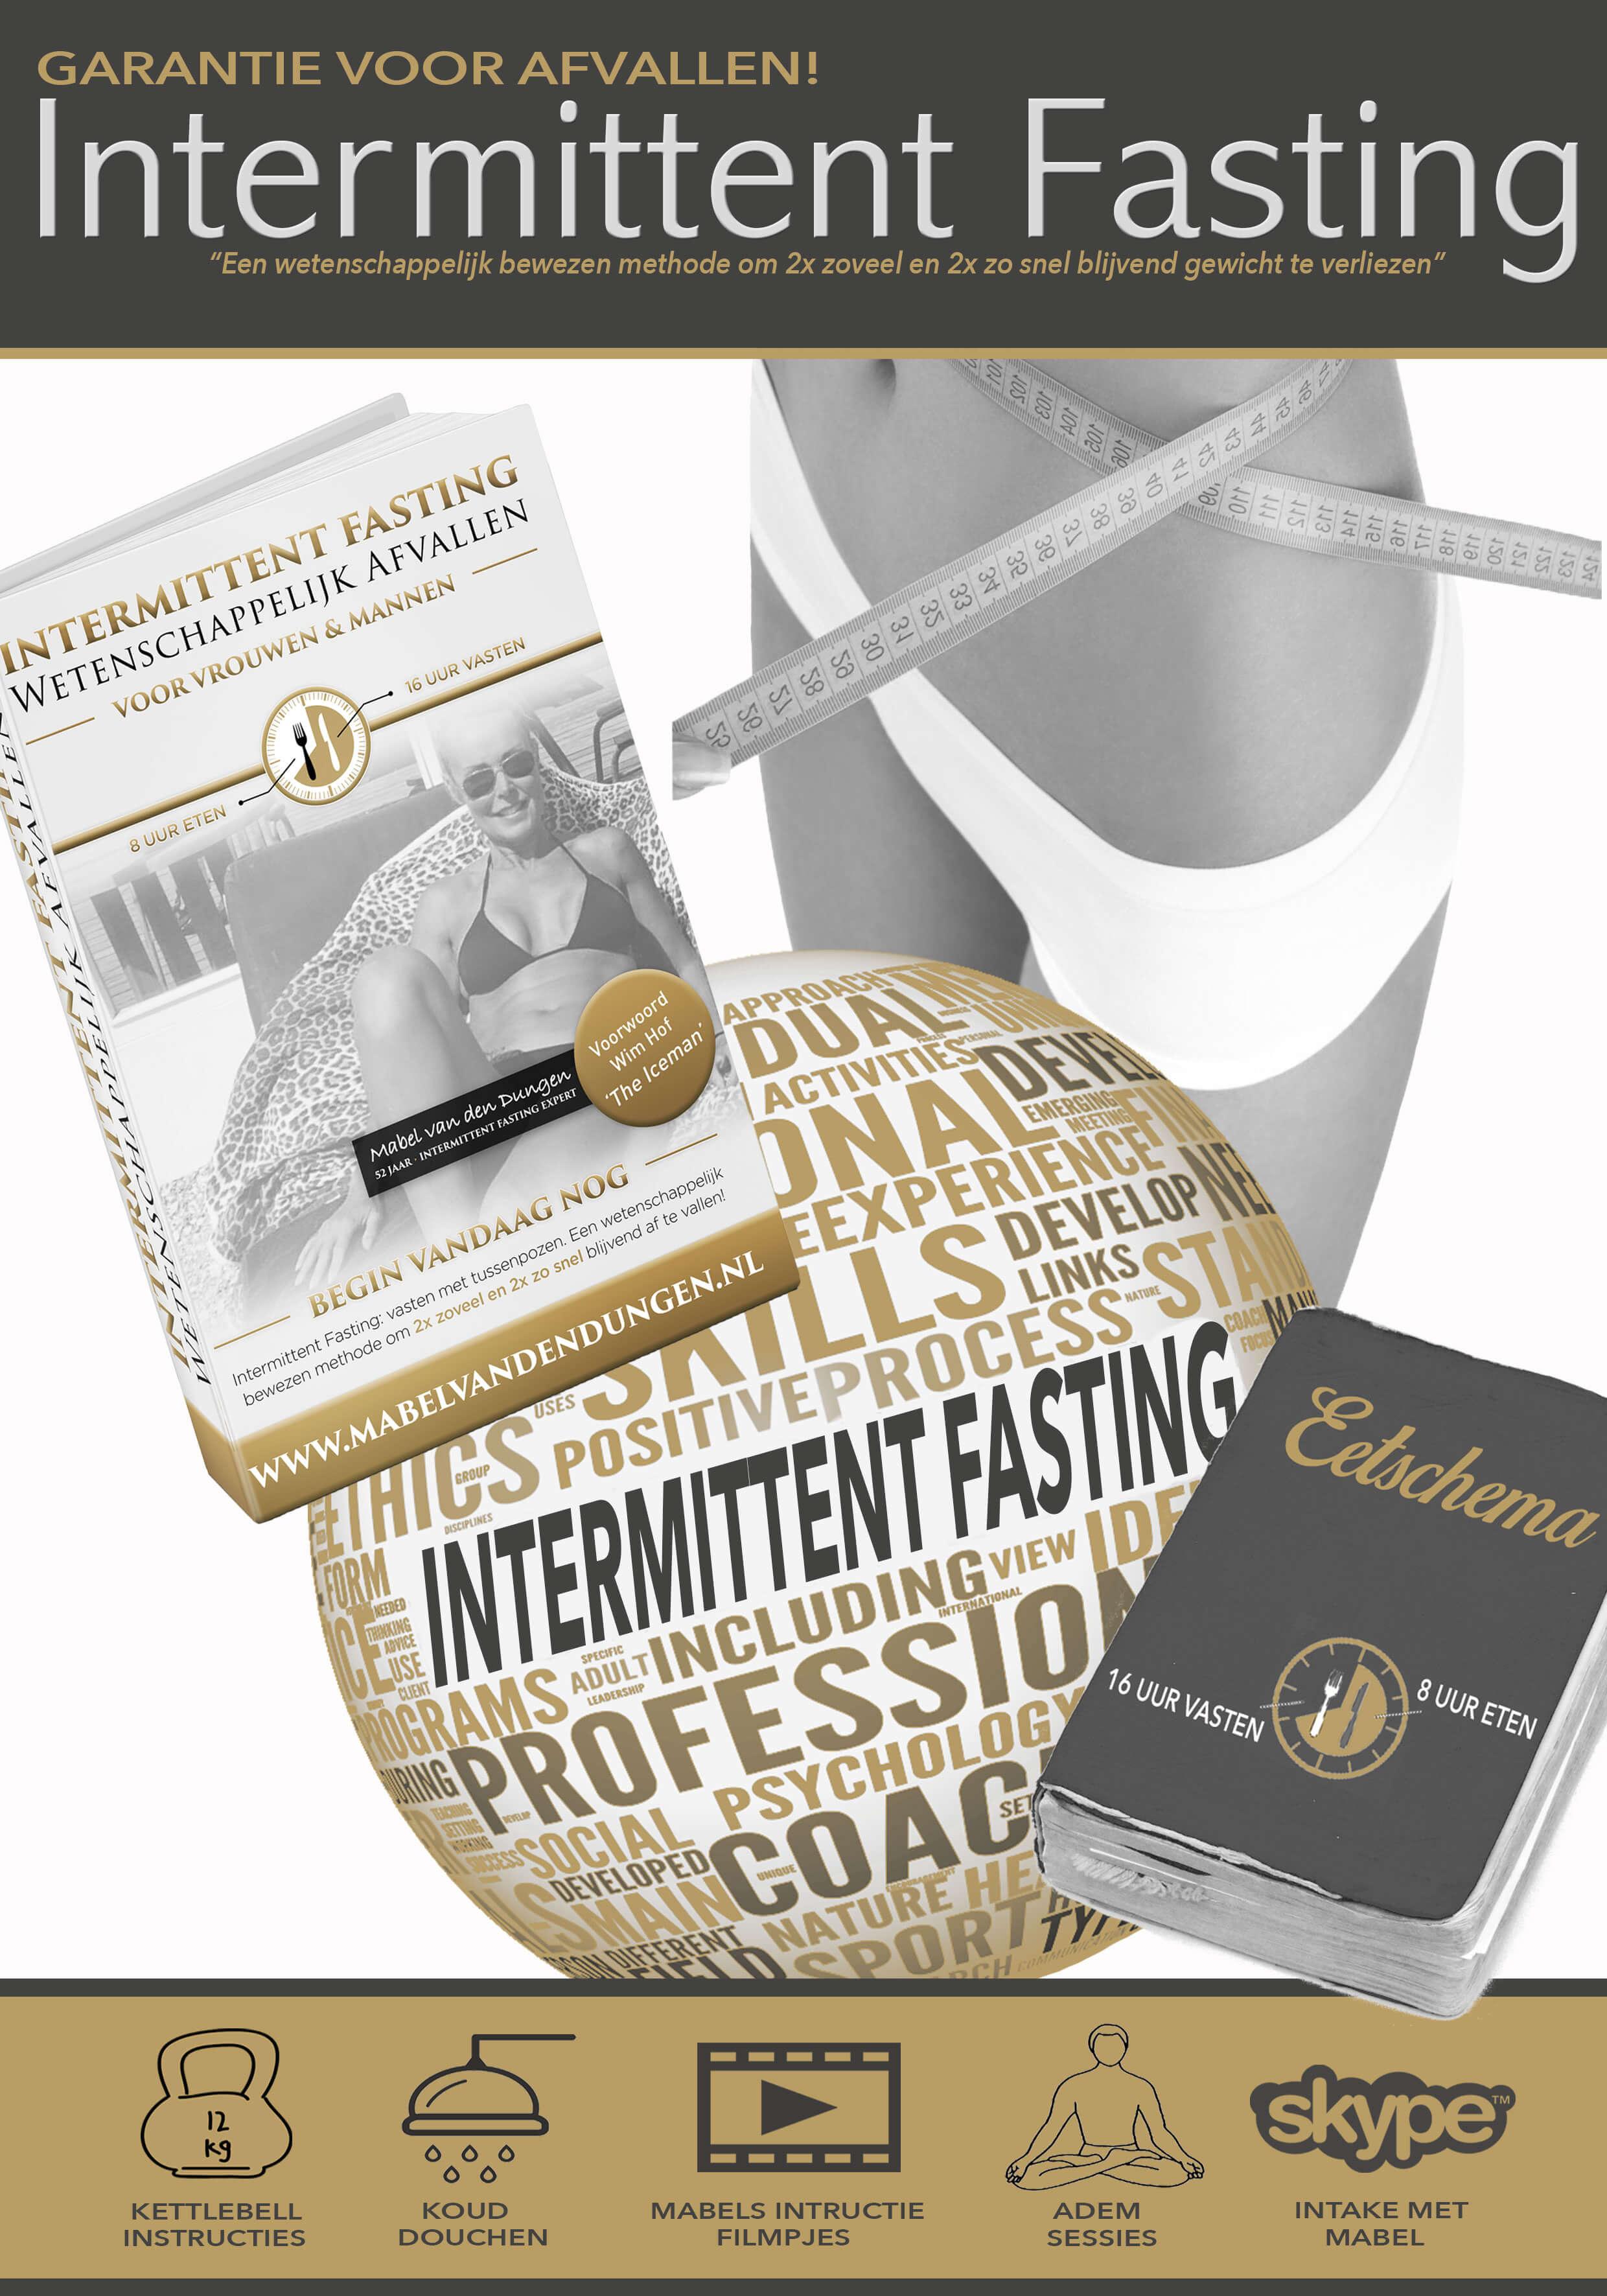 ntermittent fasting programma